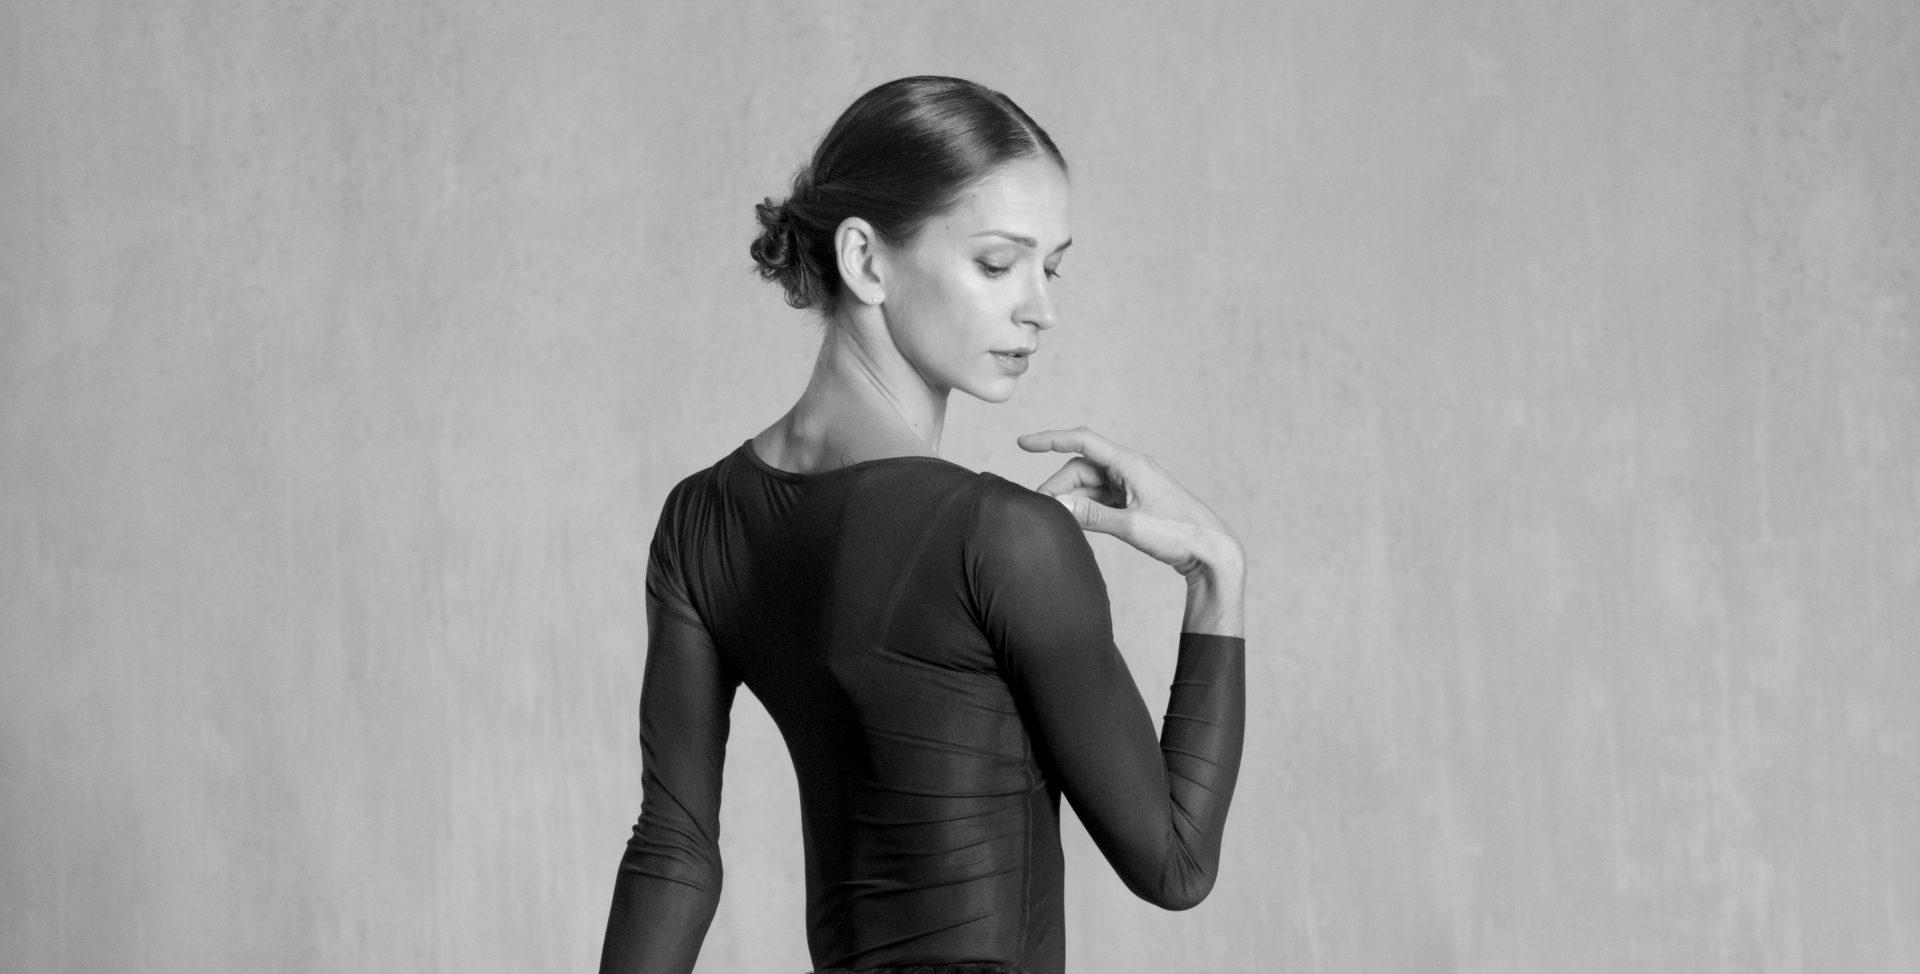 Polina Semionova